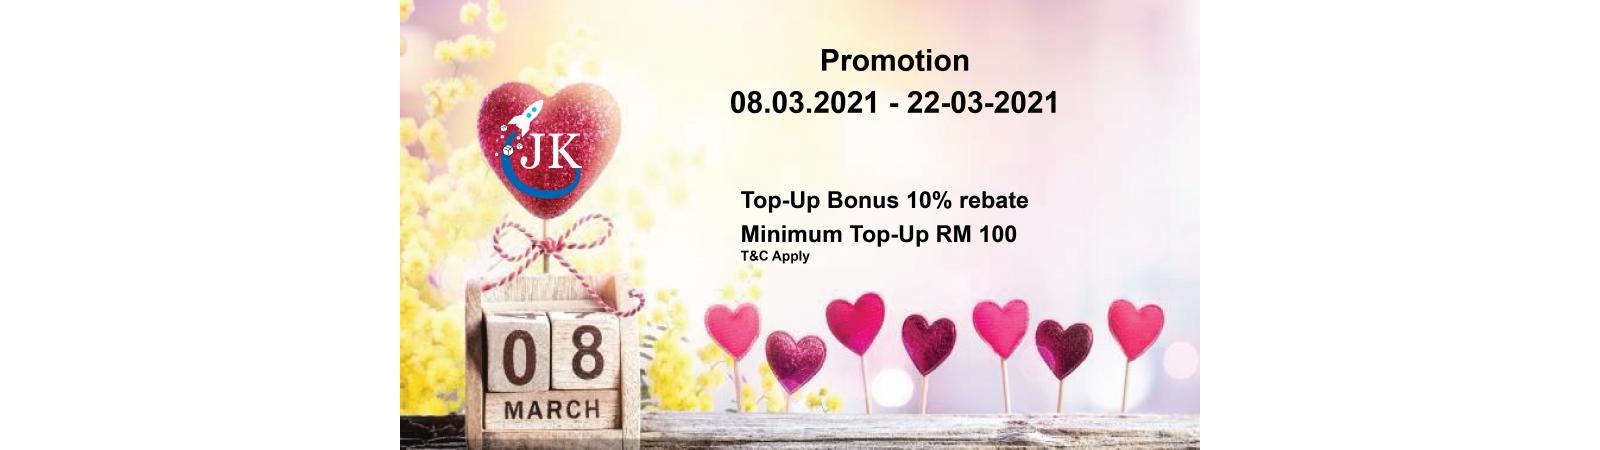 08.03.2021 Promotion